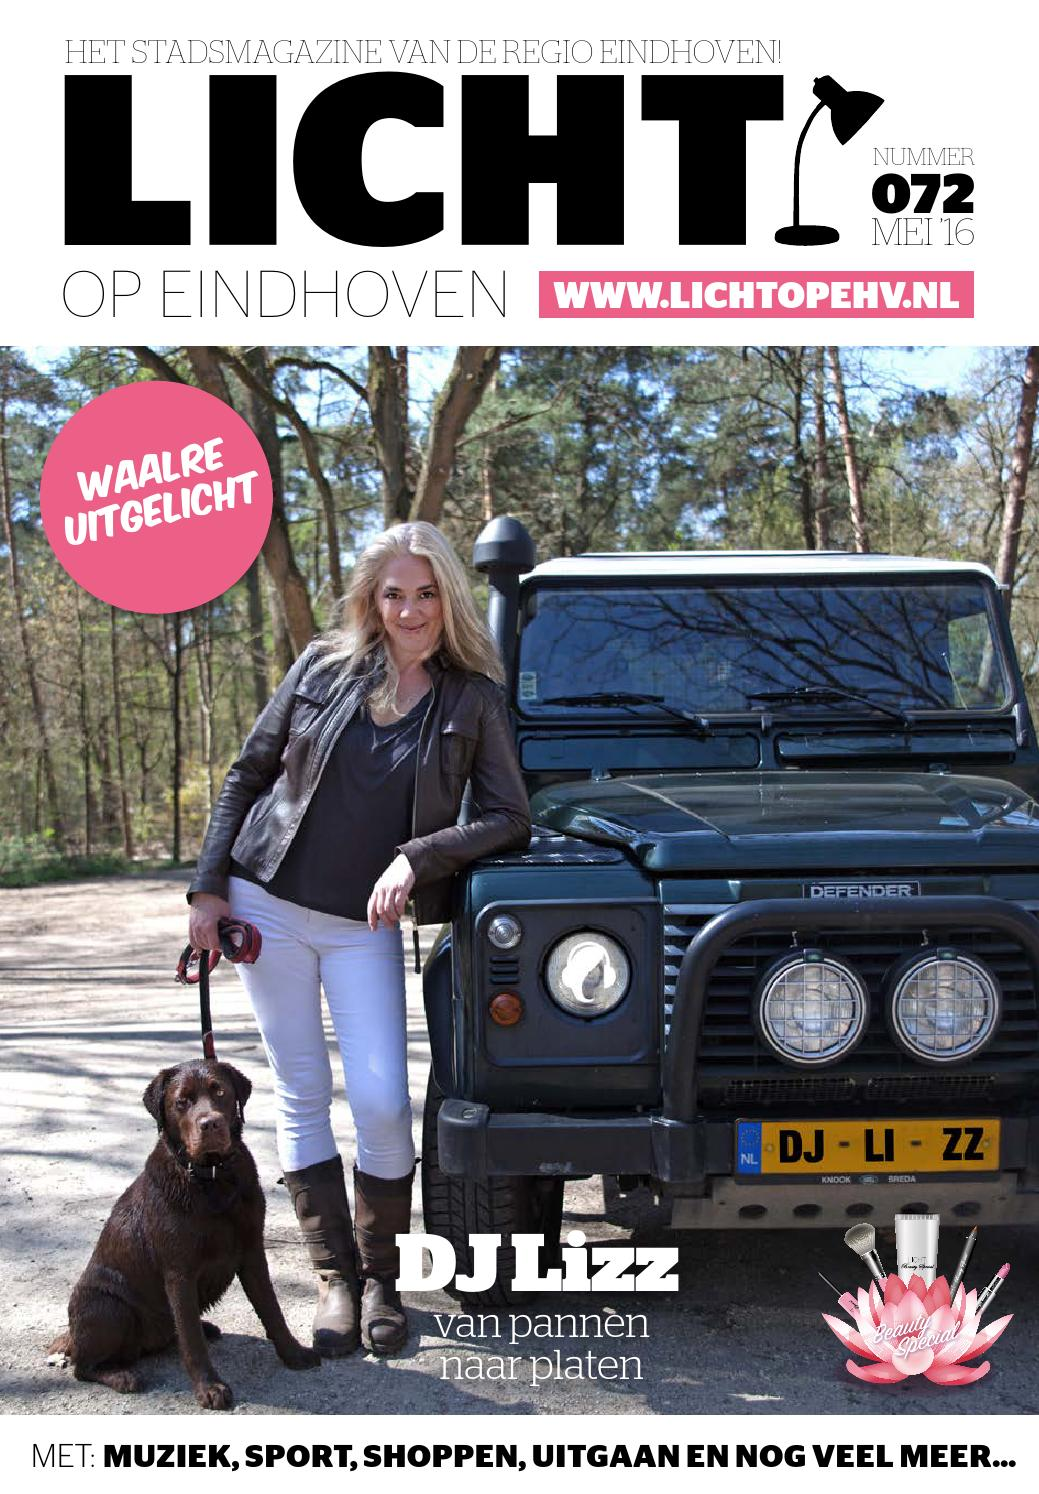 FRITS MAGAZINE 37 by Eindhovens Dagblad - issuu